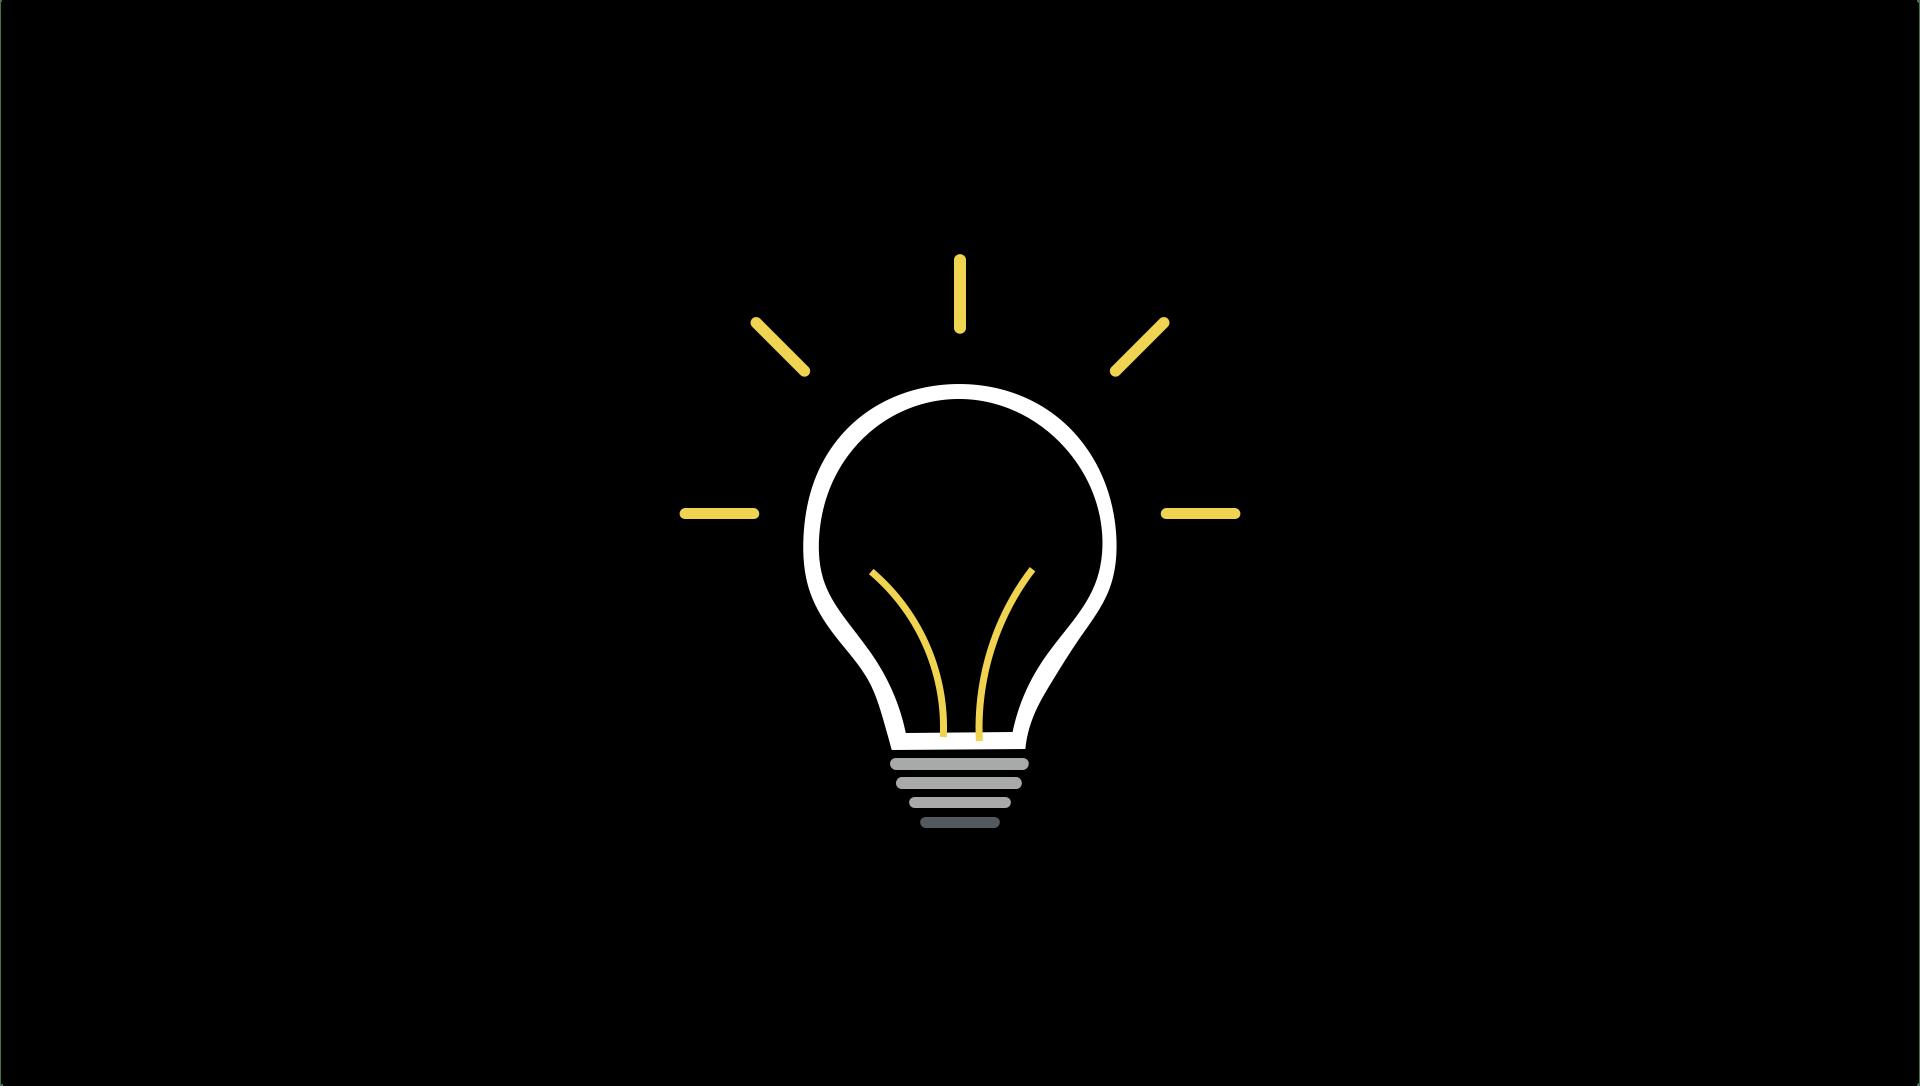 Ben Franklin Light Bulb